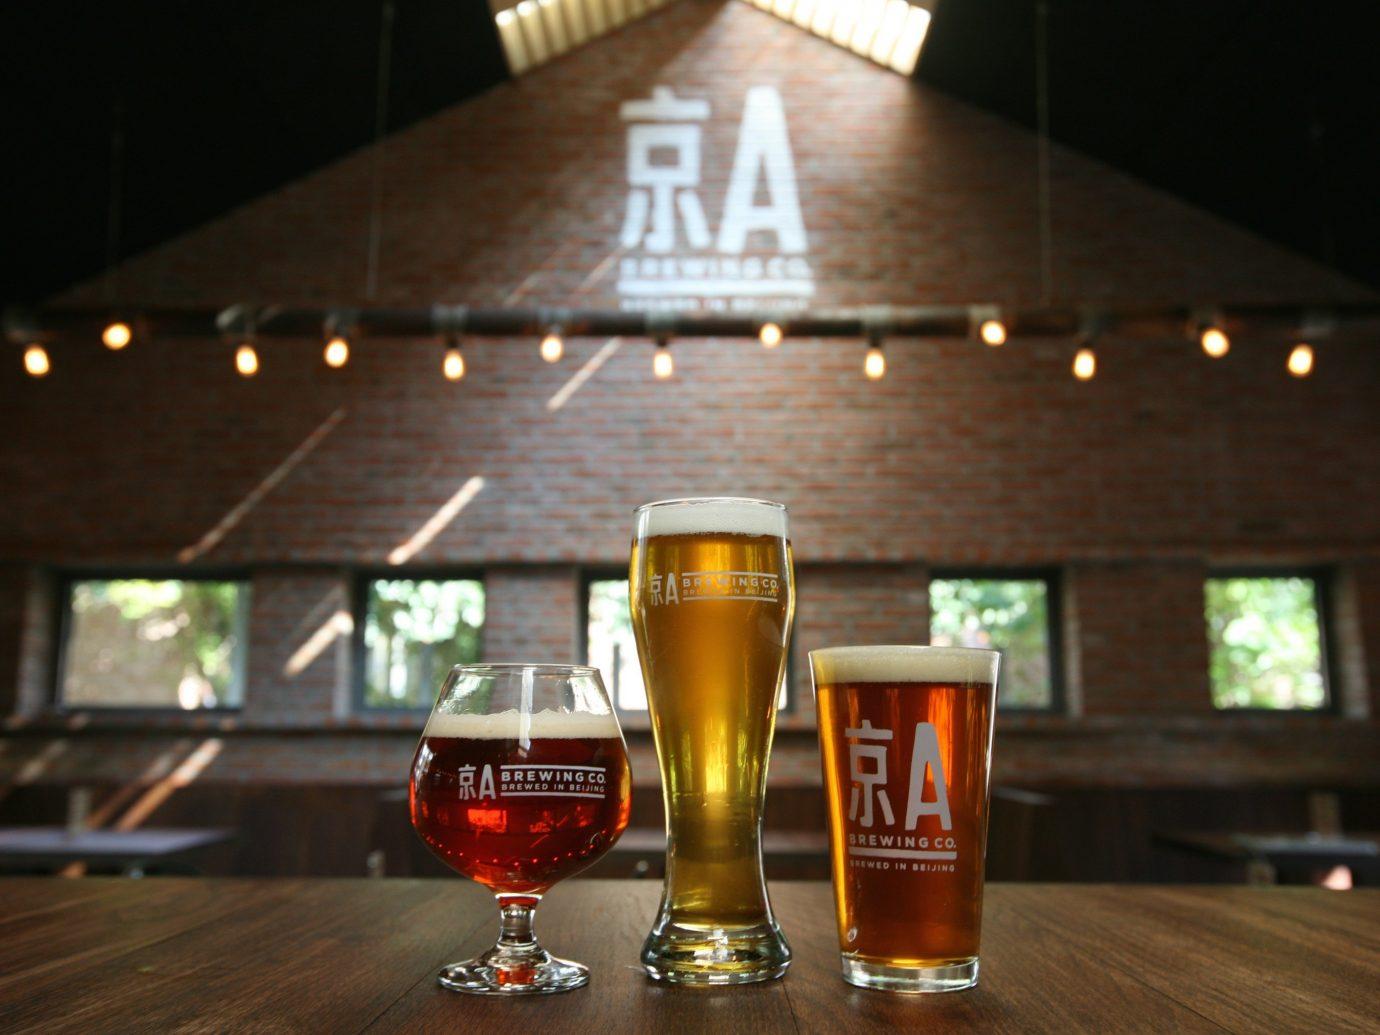 Trip Ideas table indoor Drink alcoholic beverage Bar distilled beverage restaurant beer glass